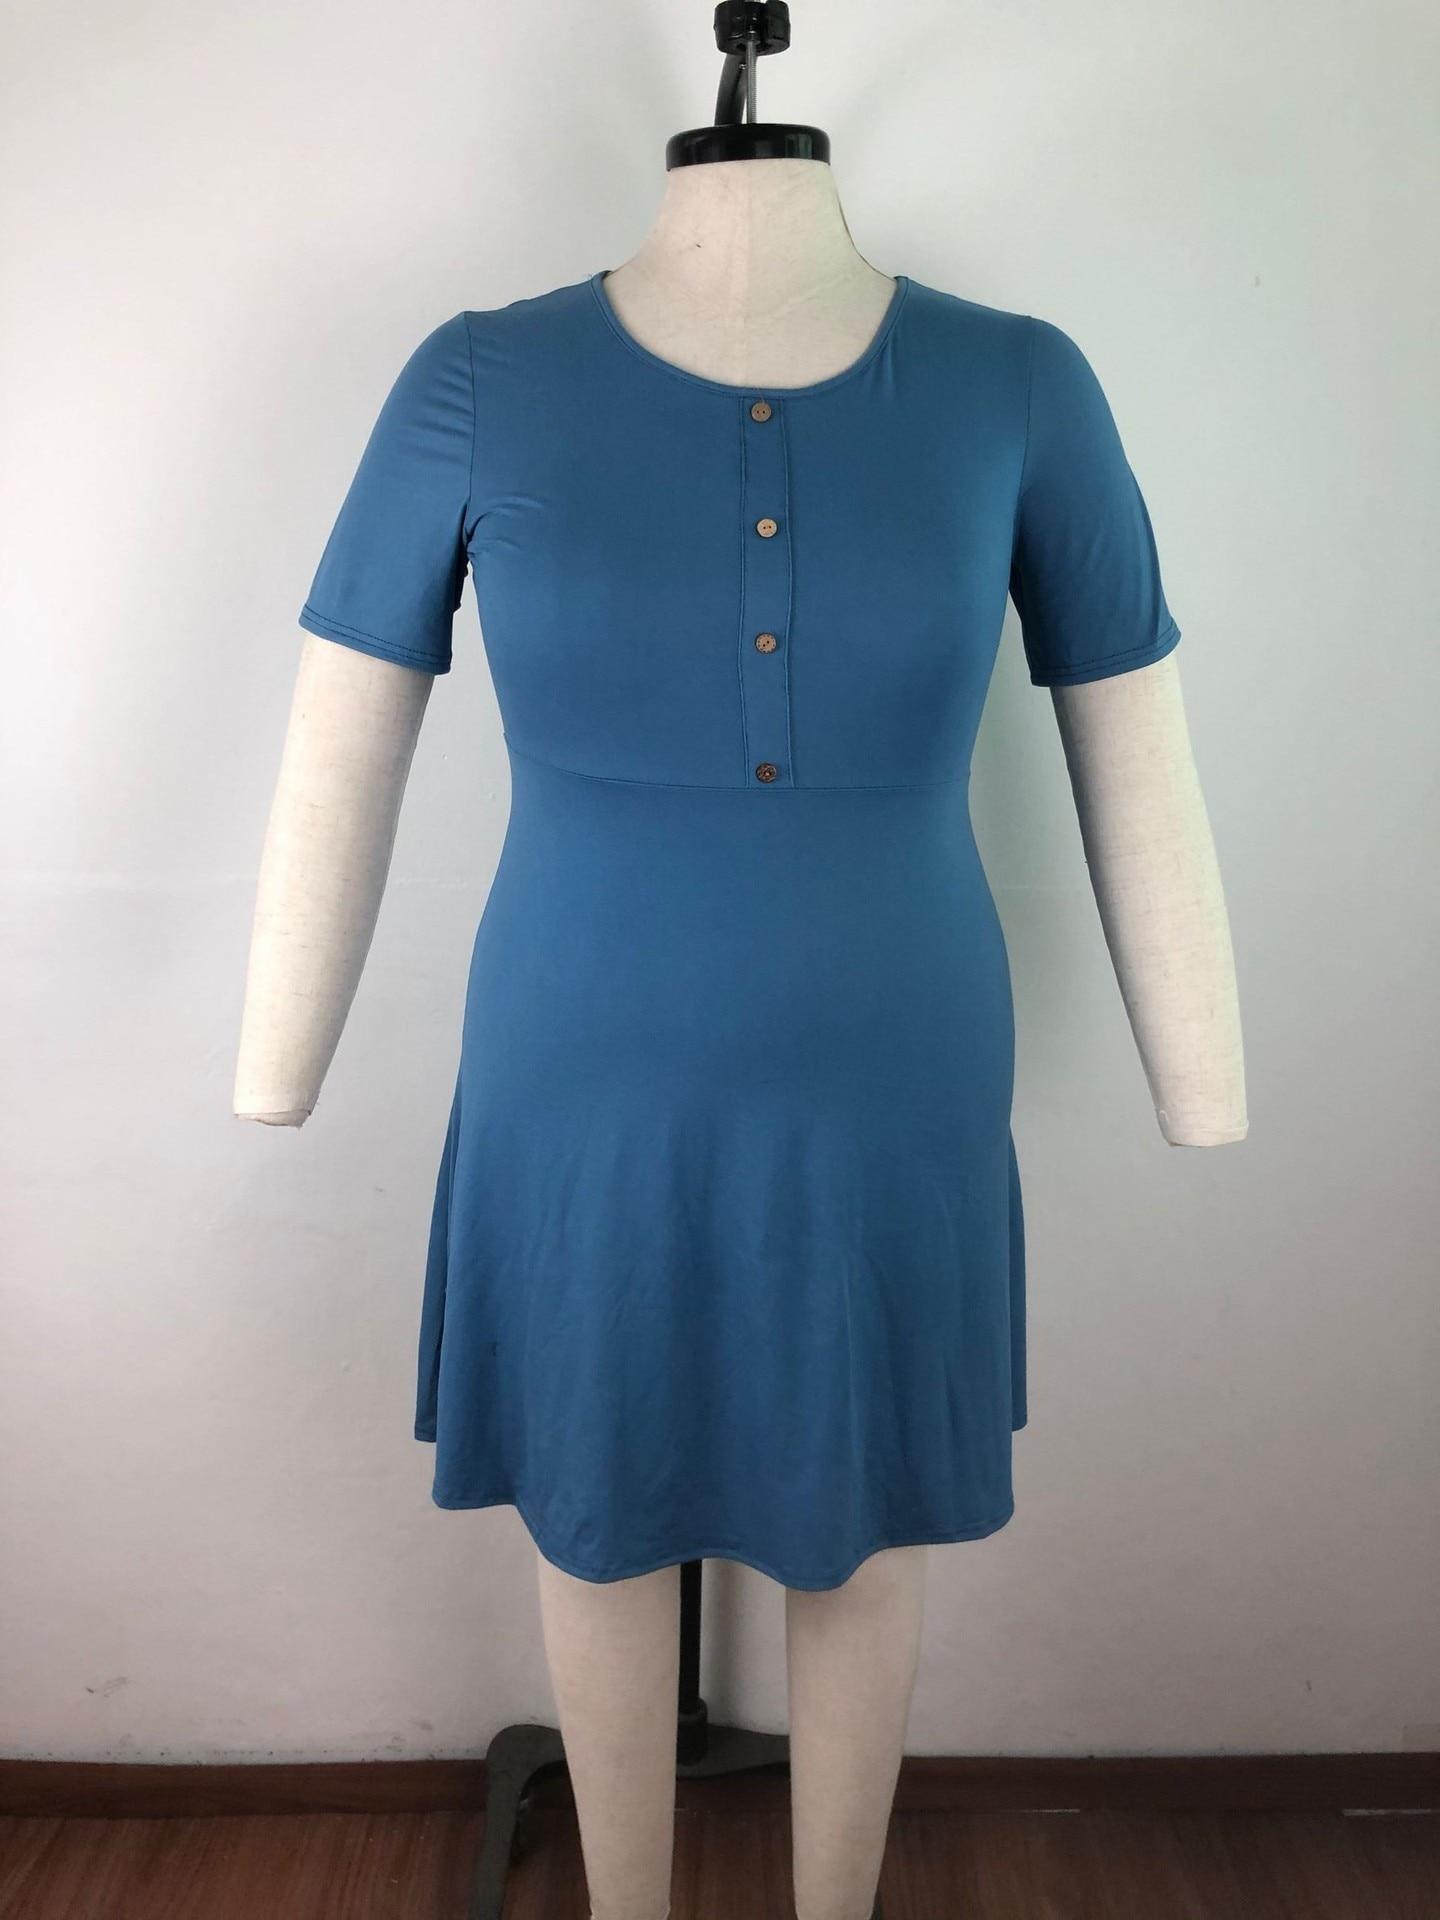 Plus Size Summer Clothes Women Oversized Dresses 5xl 4xl 3xl Black Pink Plus Size Jurken Plus Rozmiar Sukienki Dames Kleding